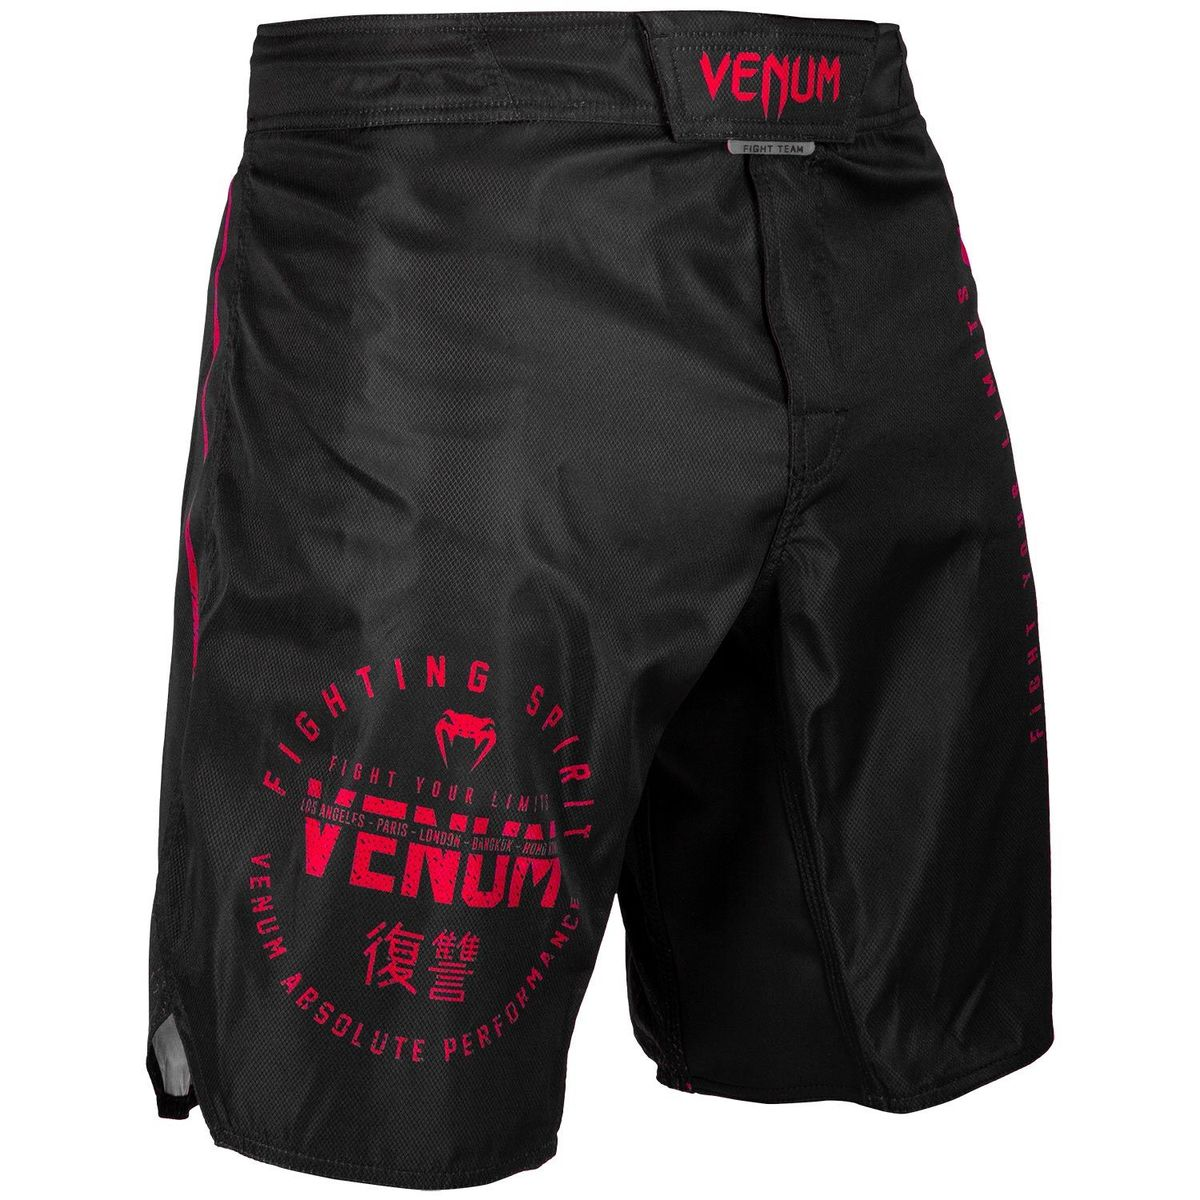 boxerské kraťasy VENUM - Signature Fightshorts - Black / Red - VENUM-03651-100